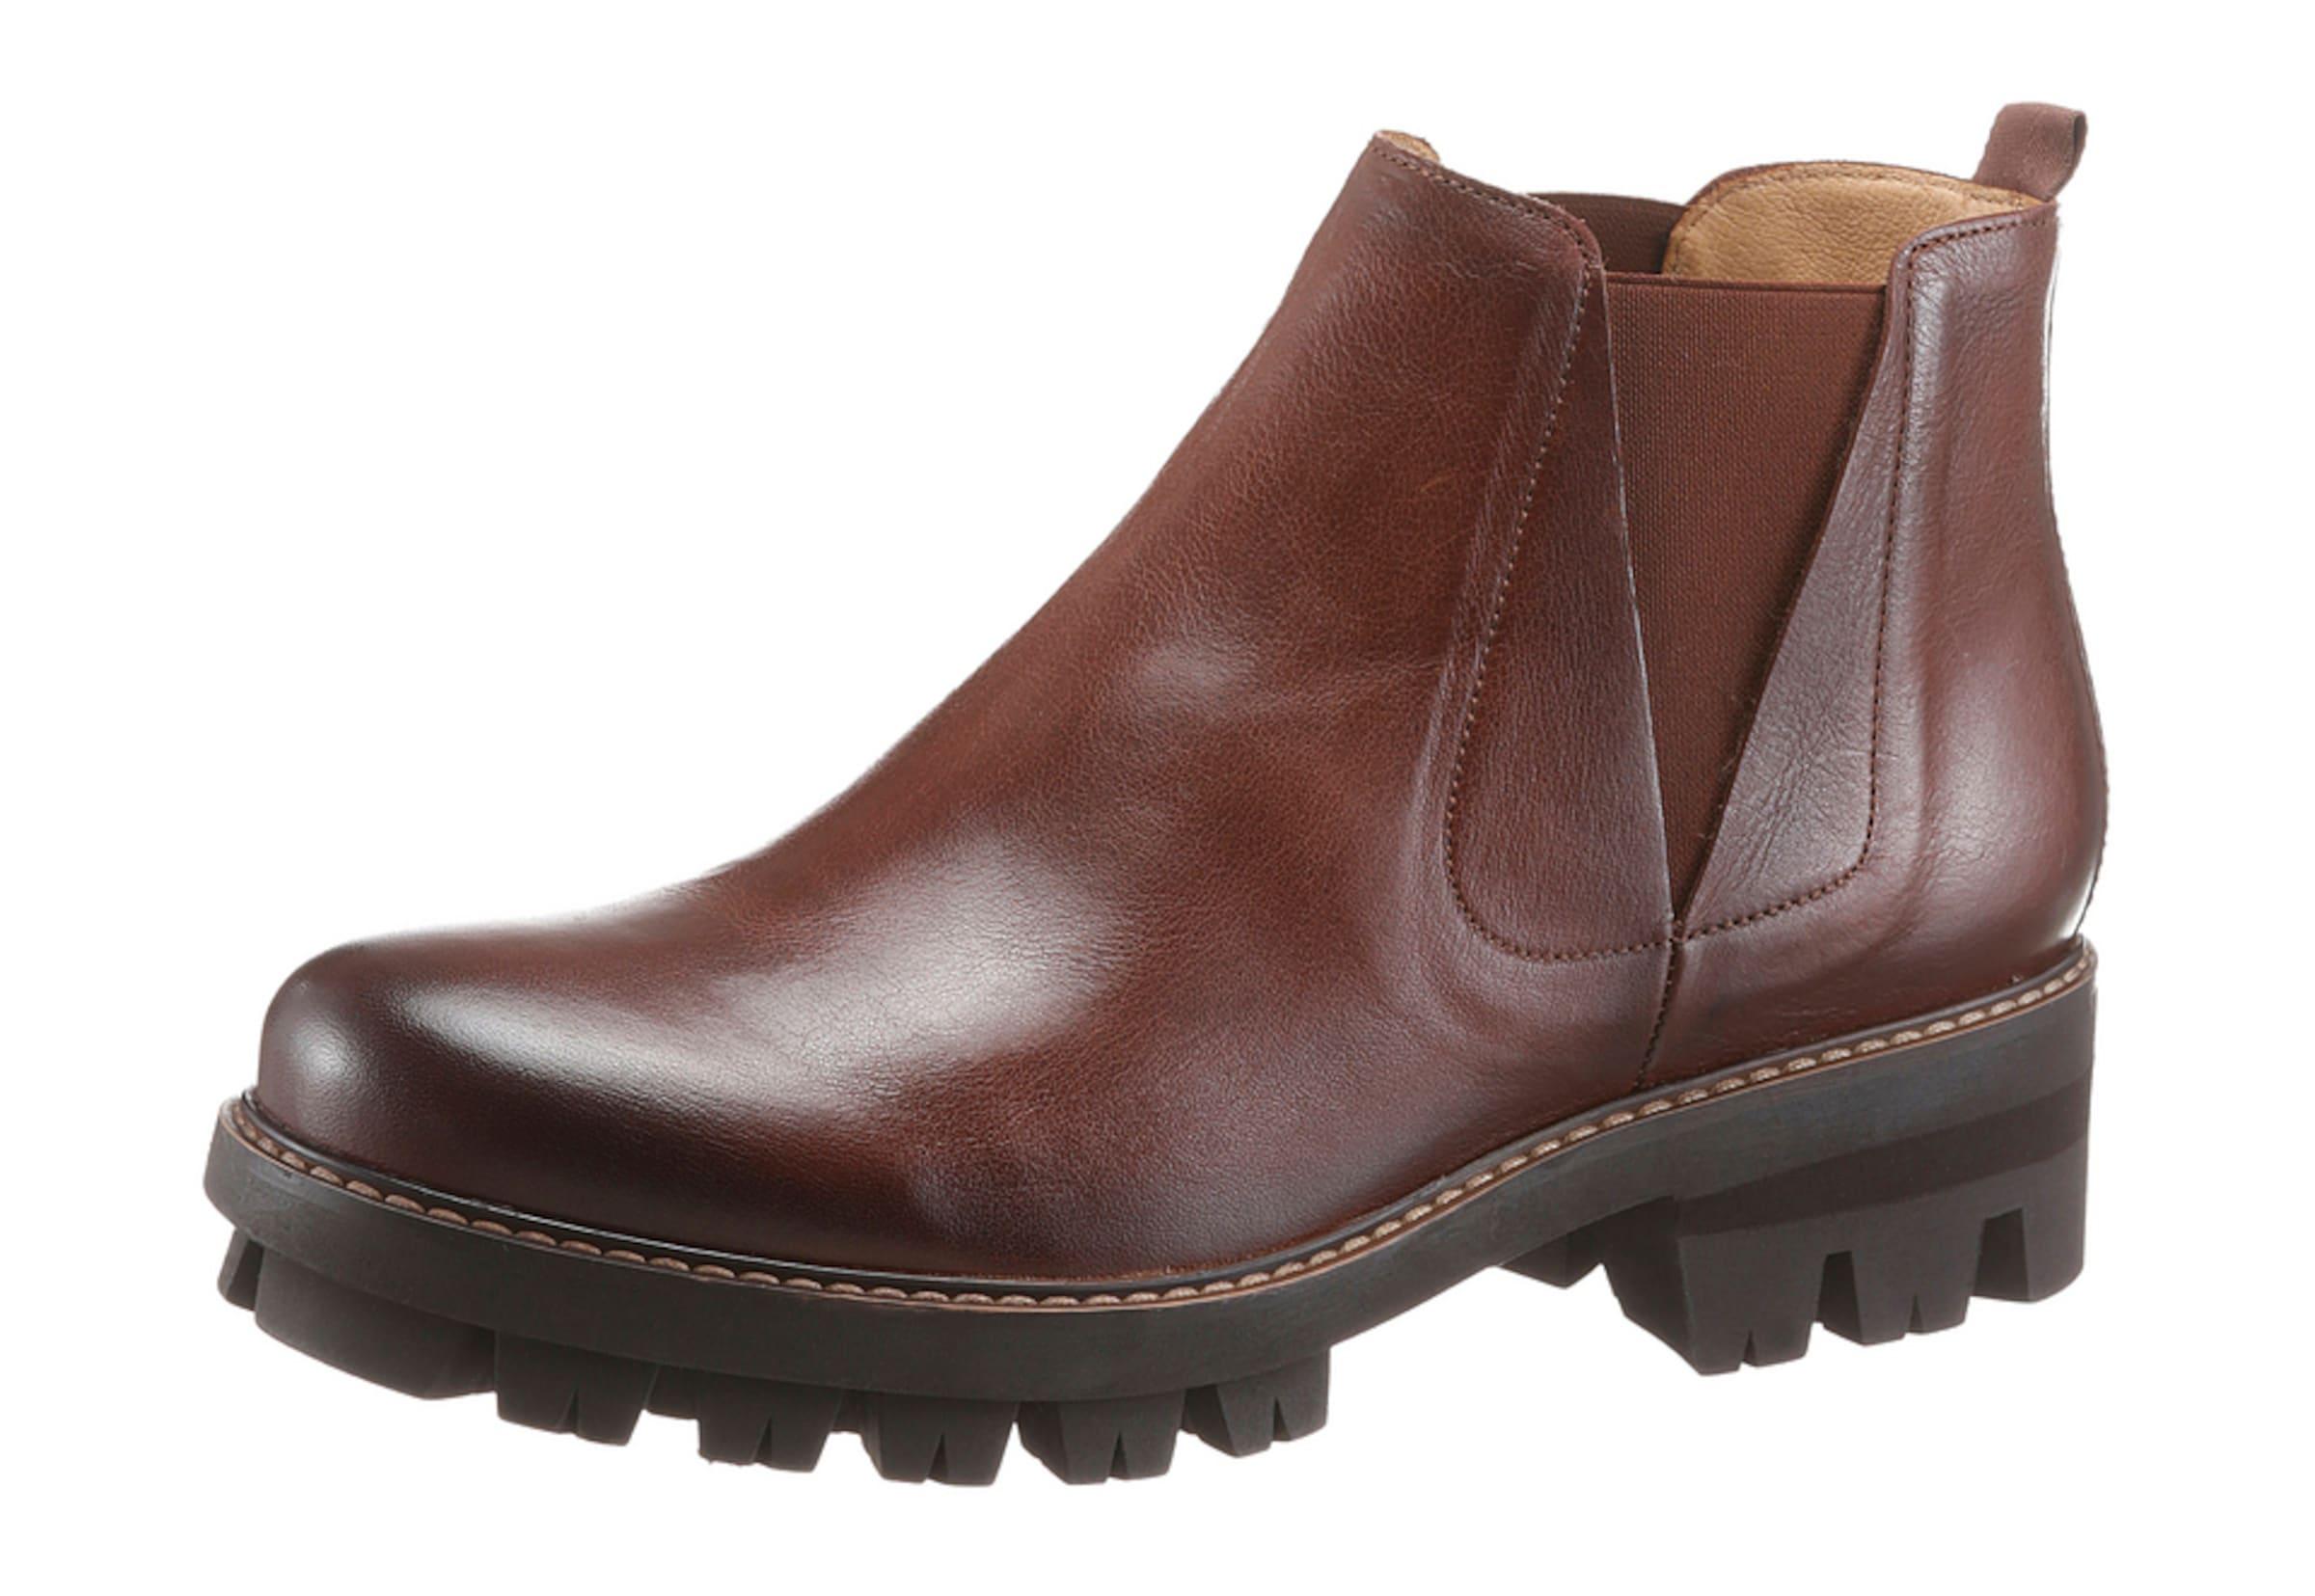 Boots In Boots Karamell In Karamell Gabor Gabor Gabor Boots